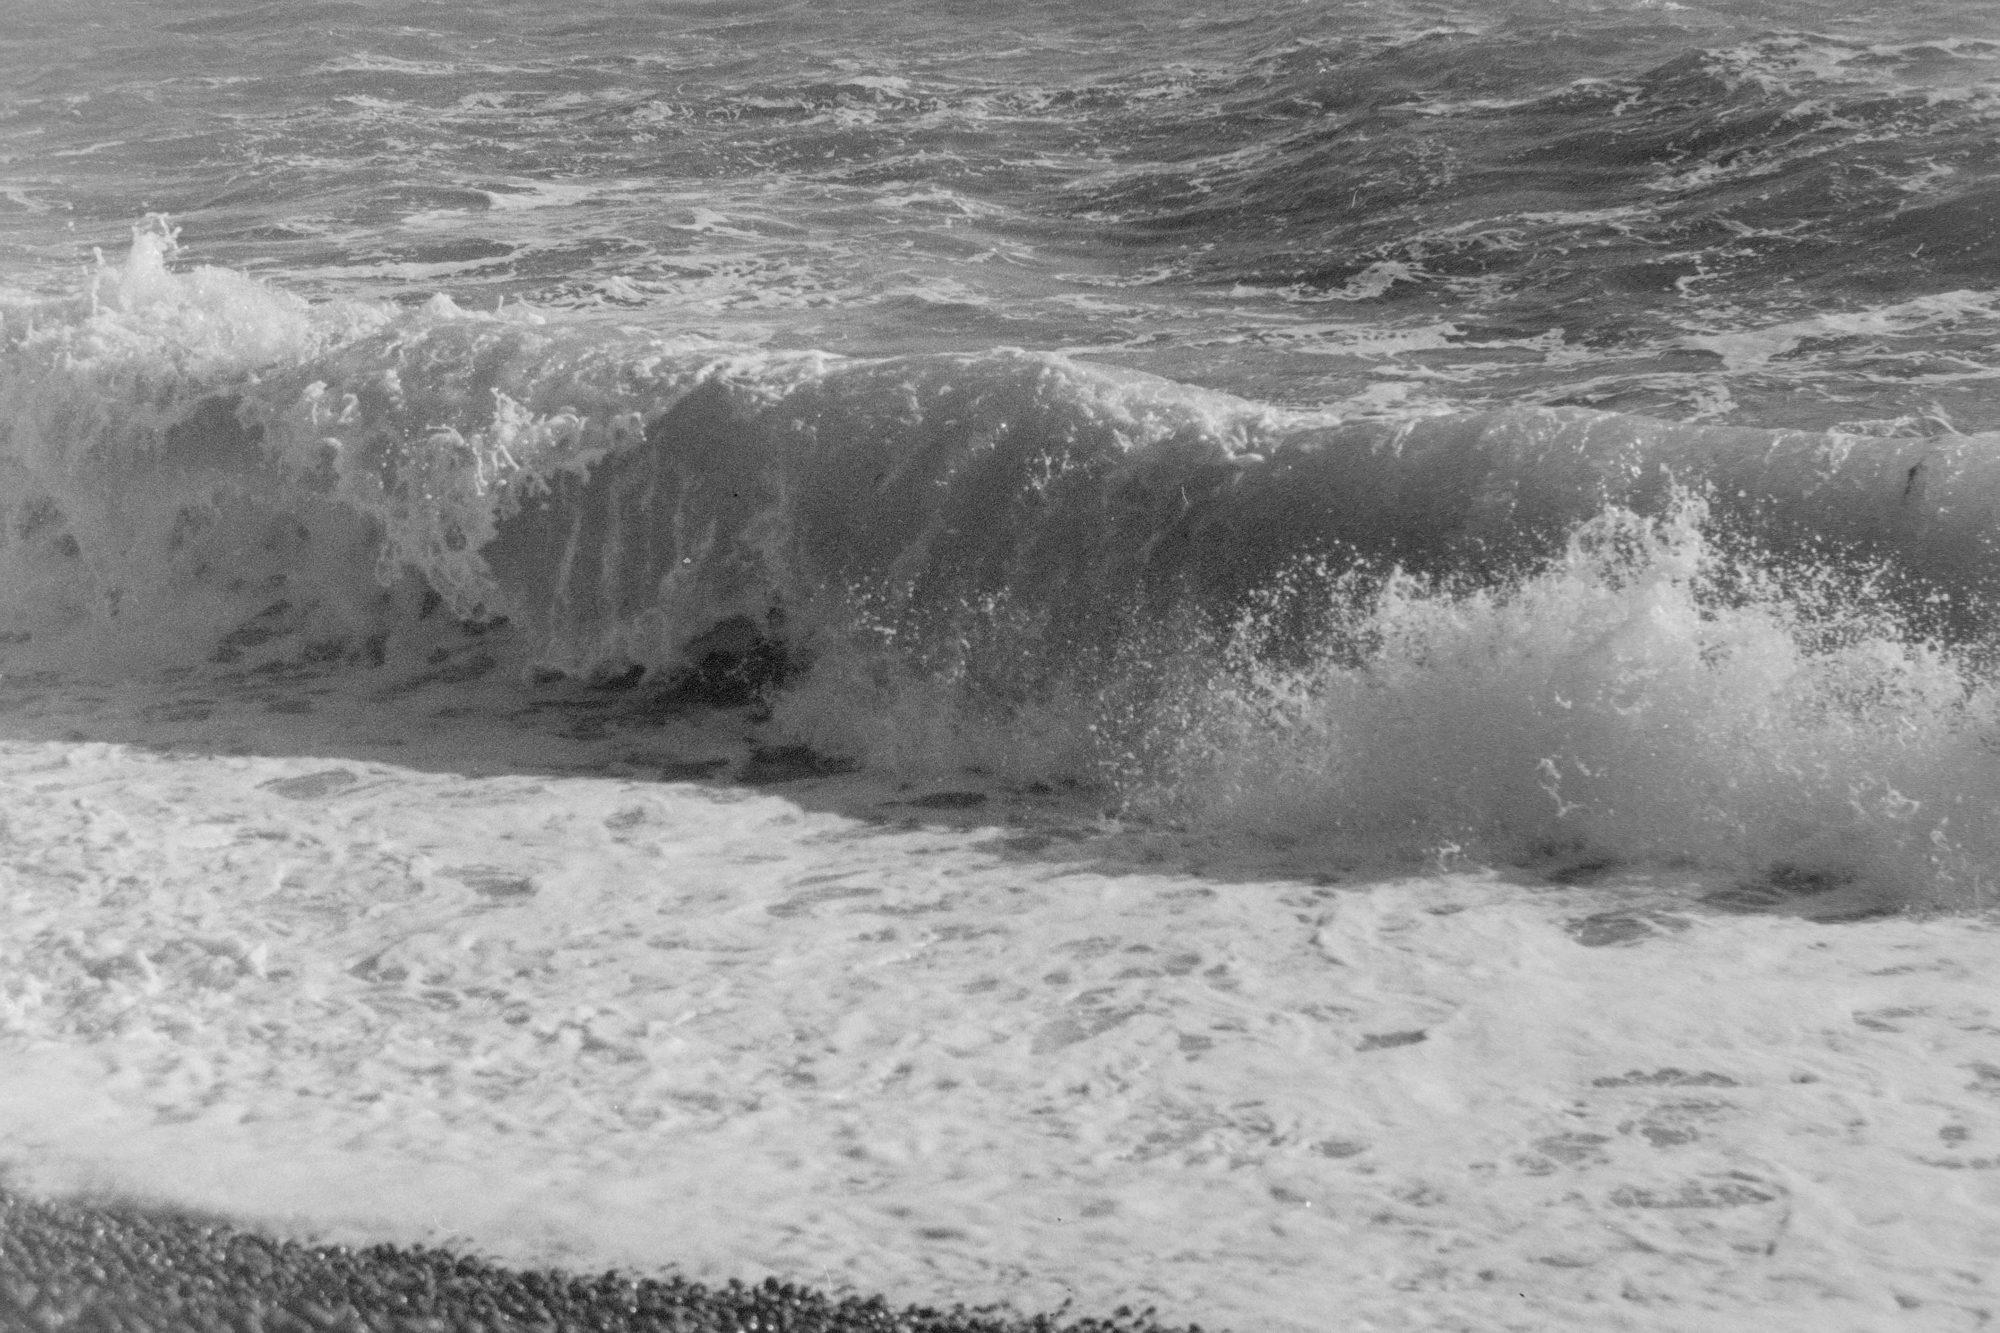 Crashing surf on beach (Pic: Rachael Tabone)